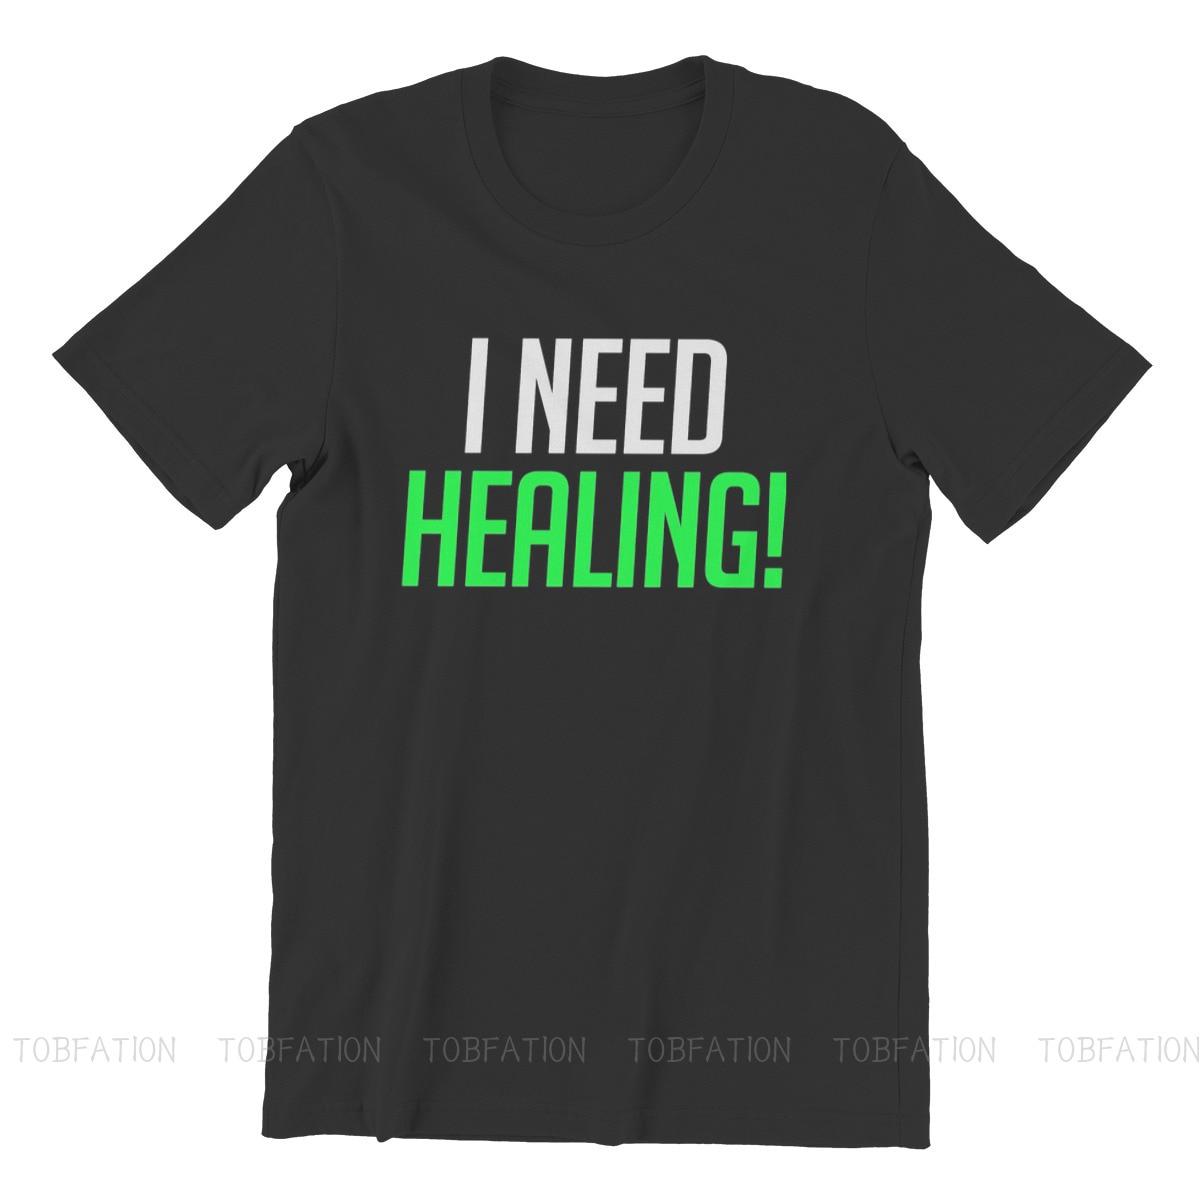 I Need Healing! Unique TShirt Overwatch Comfortable Hip Hop Gift Idea  T Shirt Short Sleeve Hot Sale 3